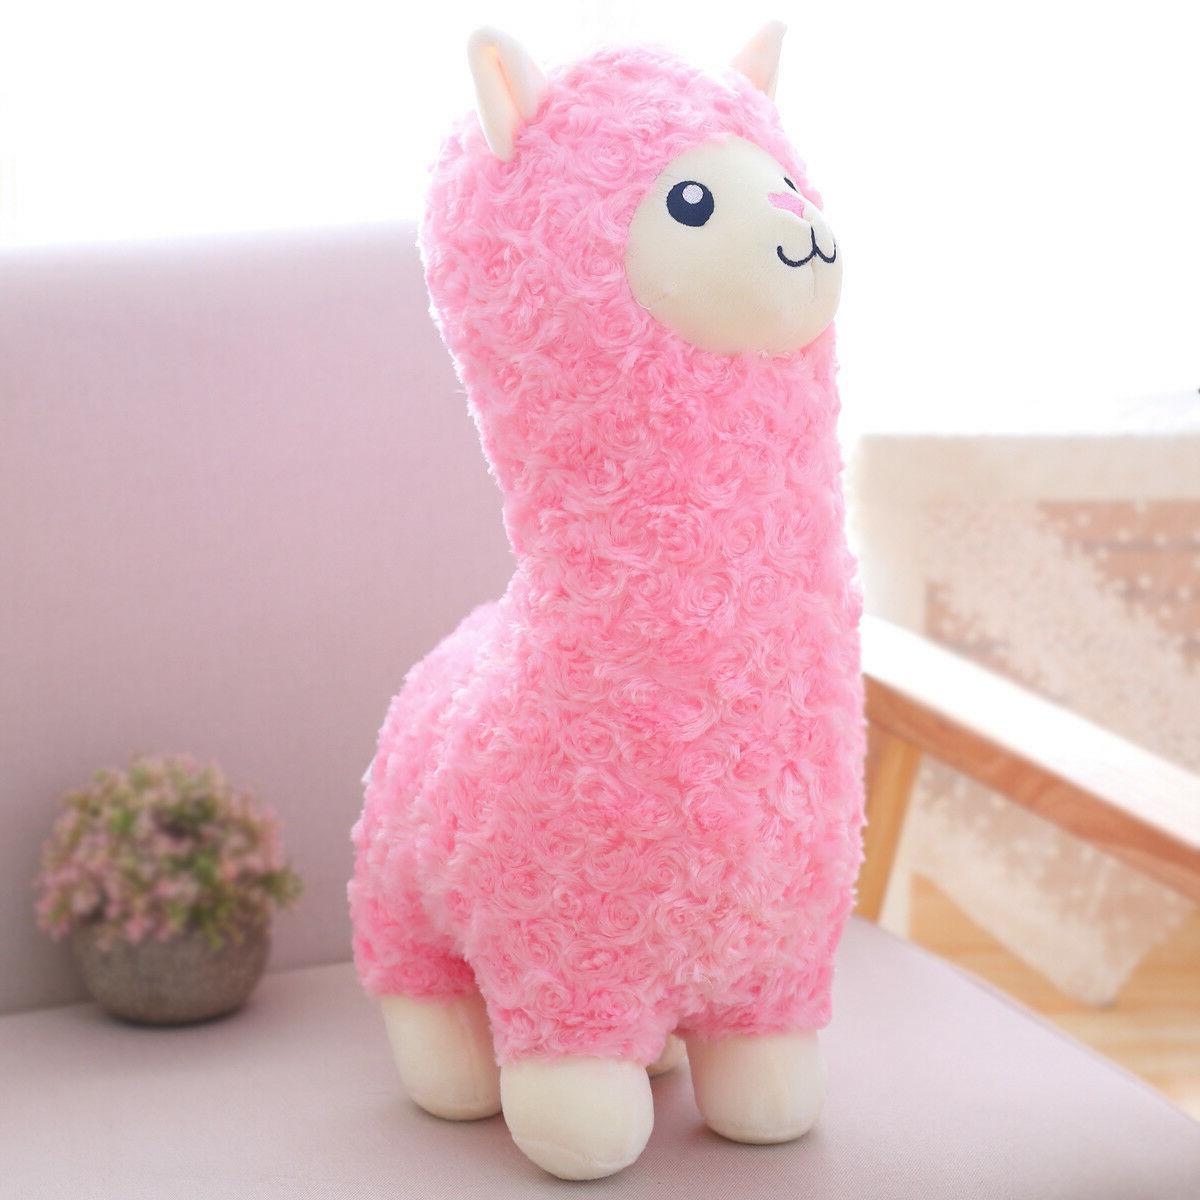 "Winsterch Llama 17.7"" Plush"